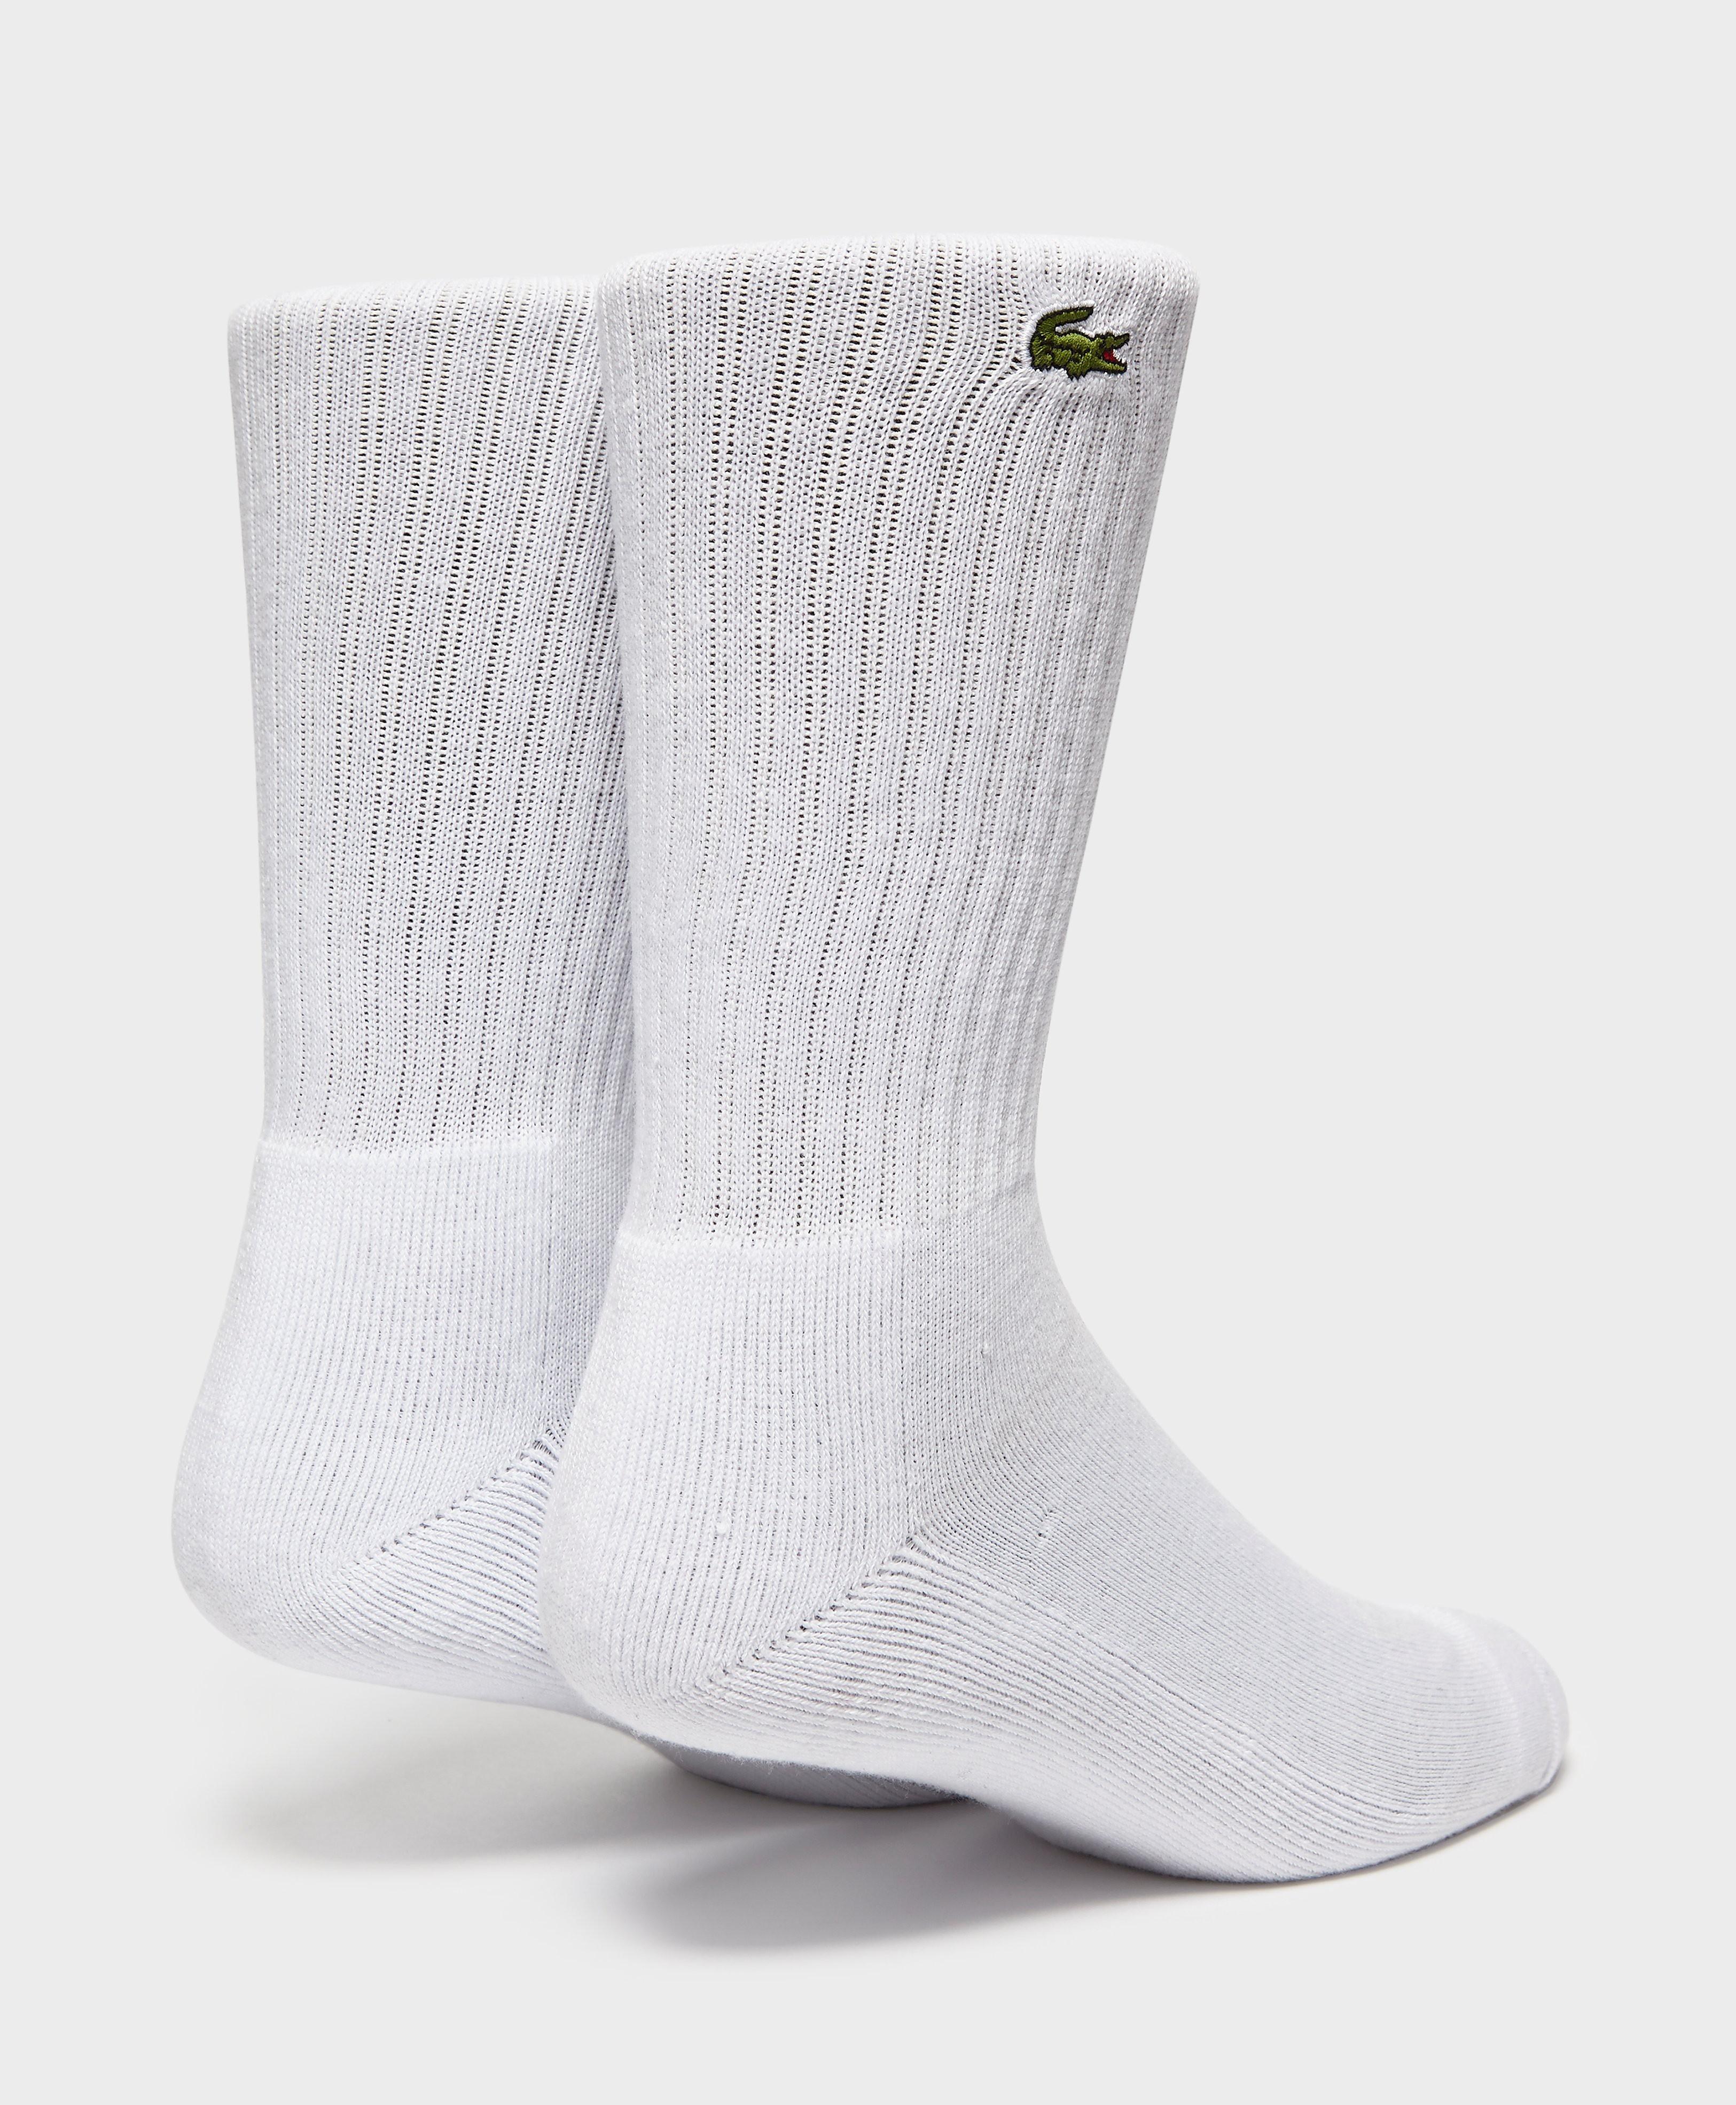 Lacoste 3 Pack Sport Socks